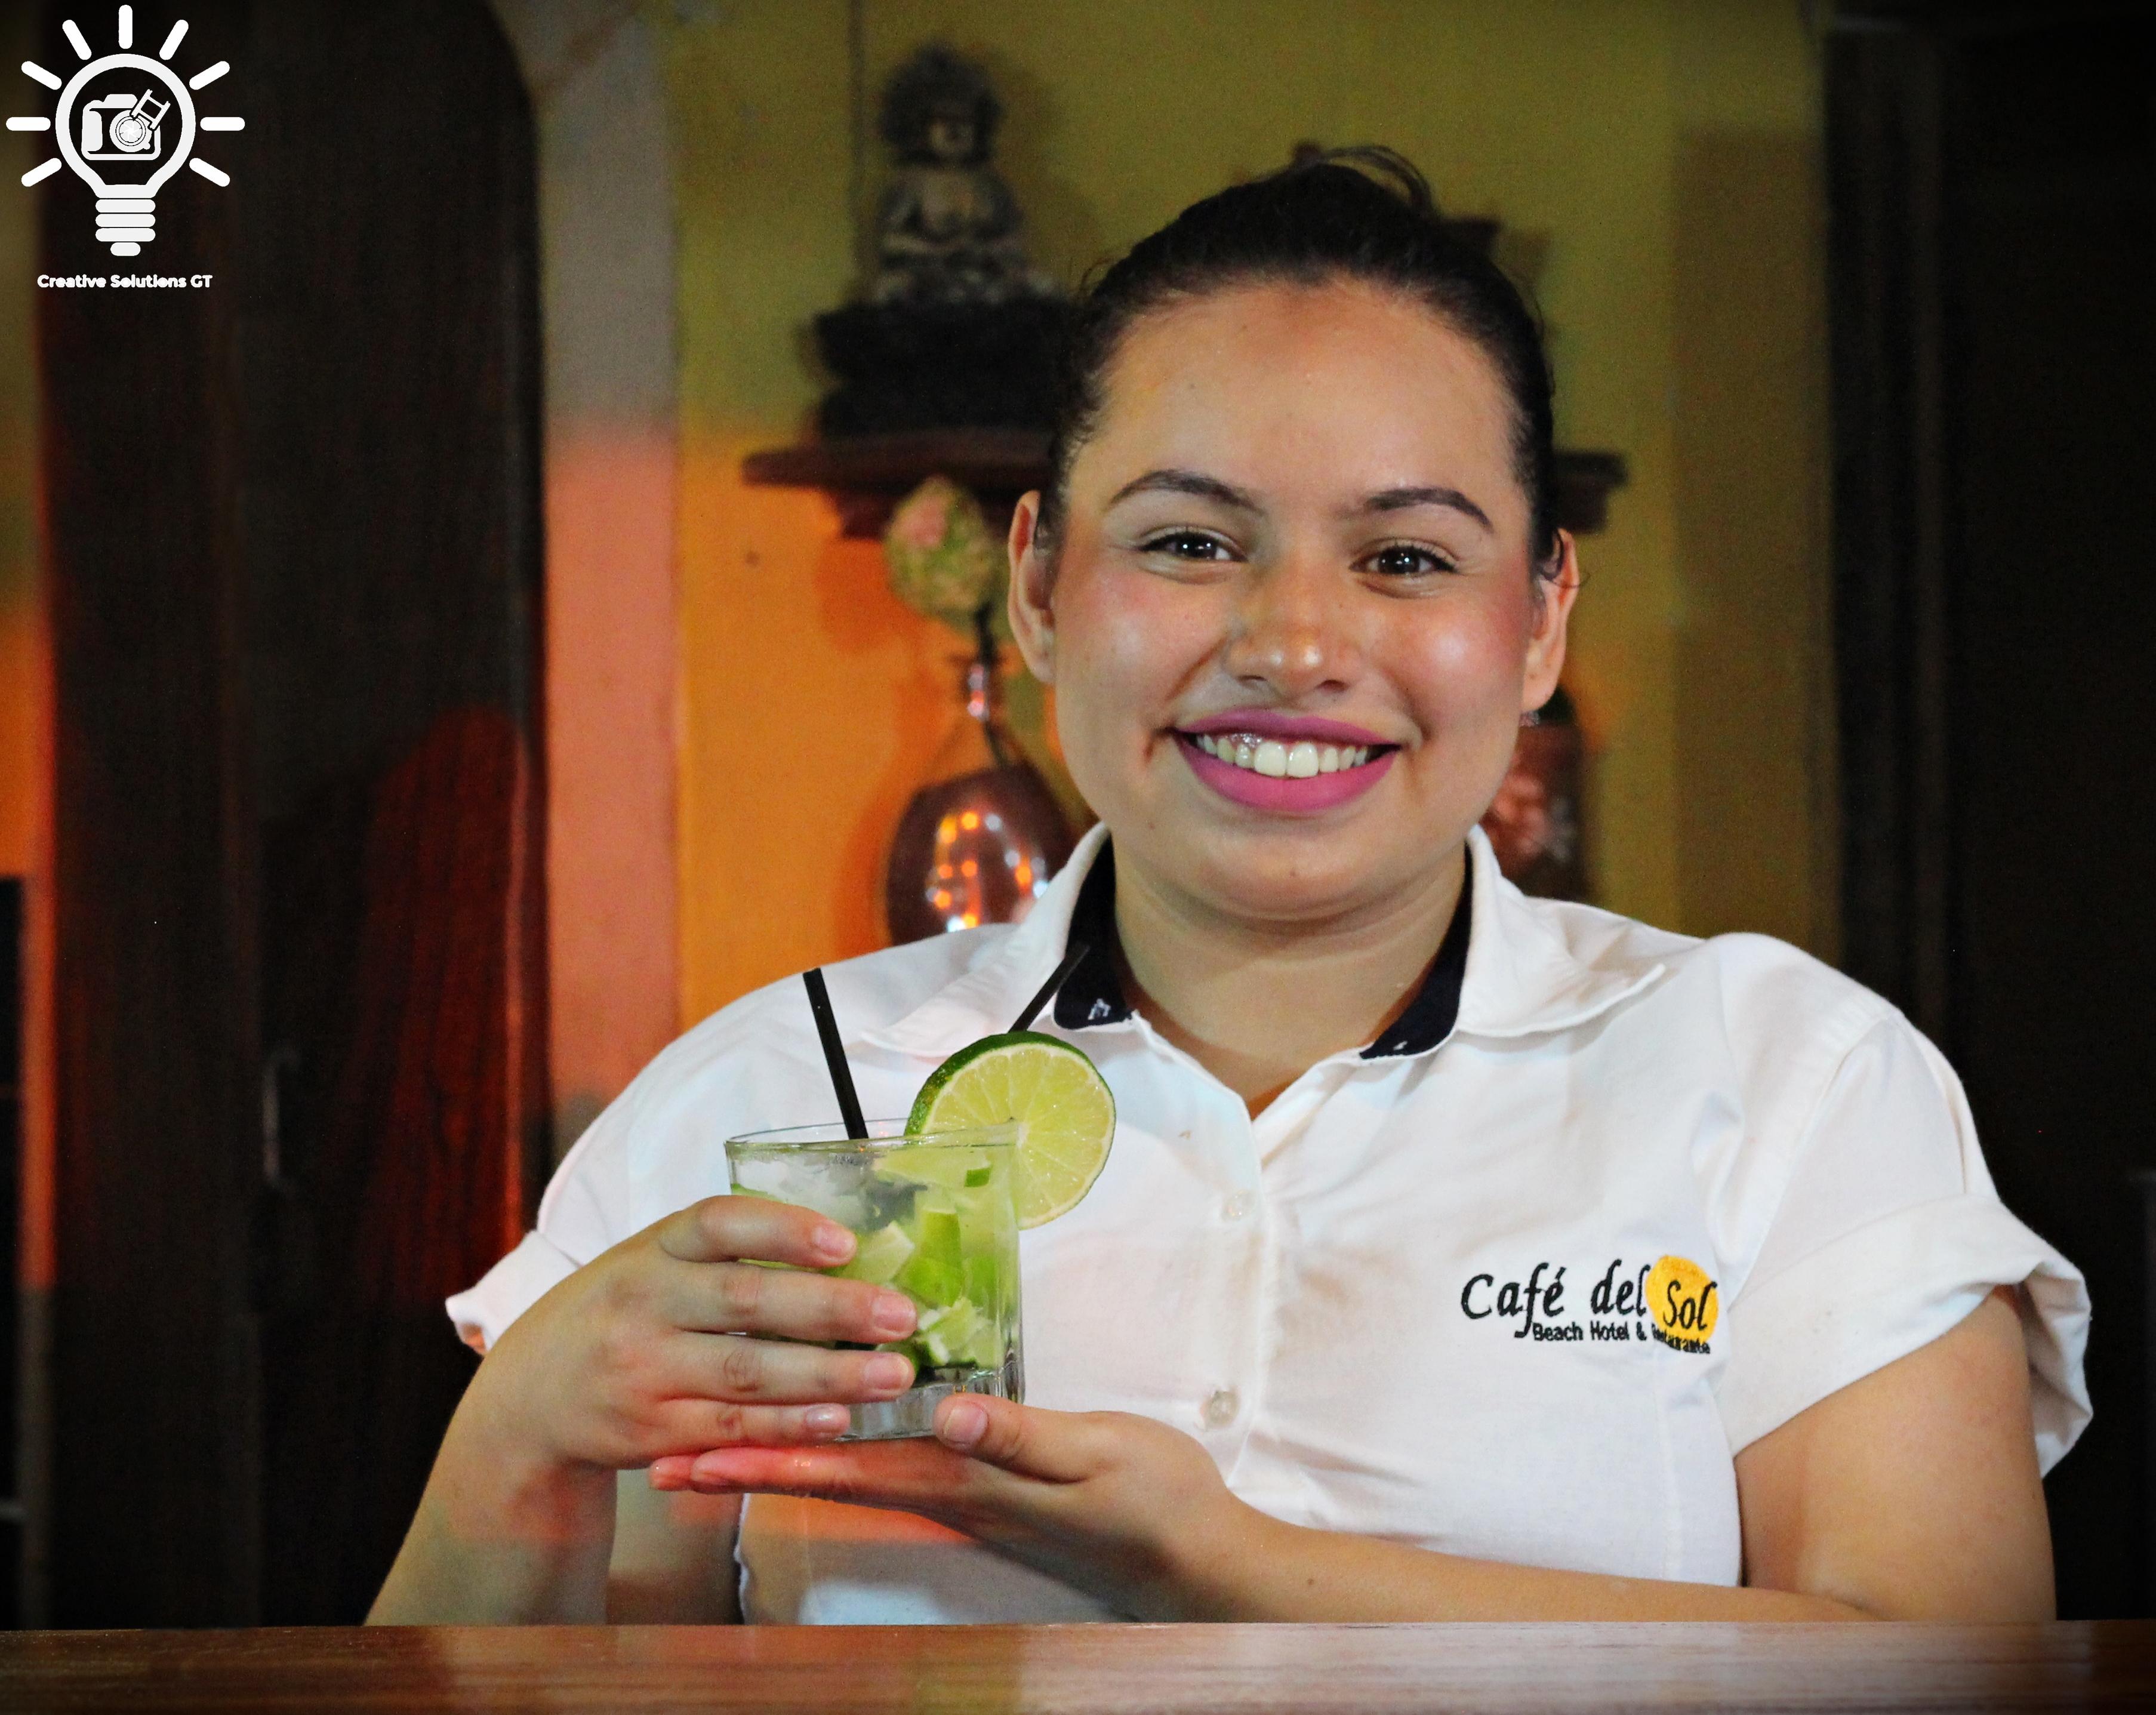 fotografia para productos en guatemala (2)